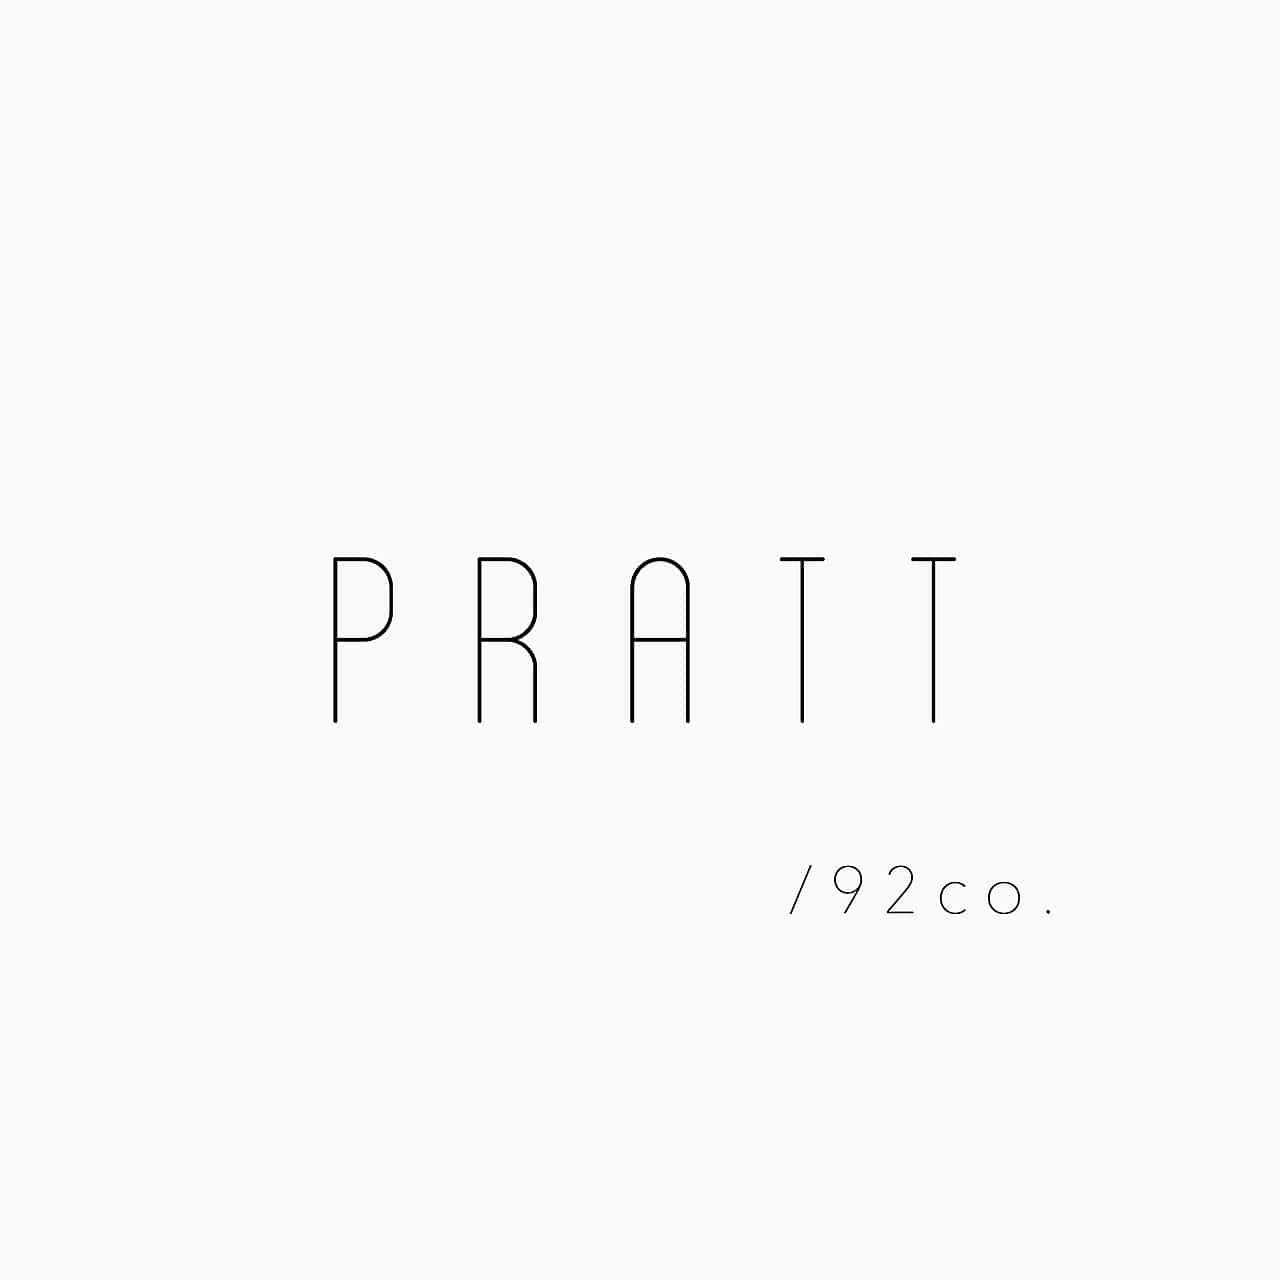 美容室PRATT / 92co.ロゴ画像